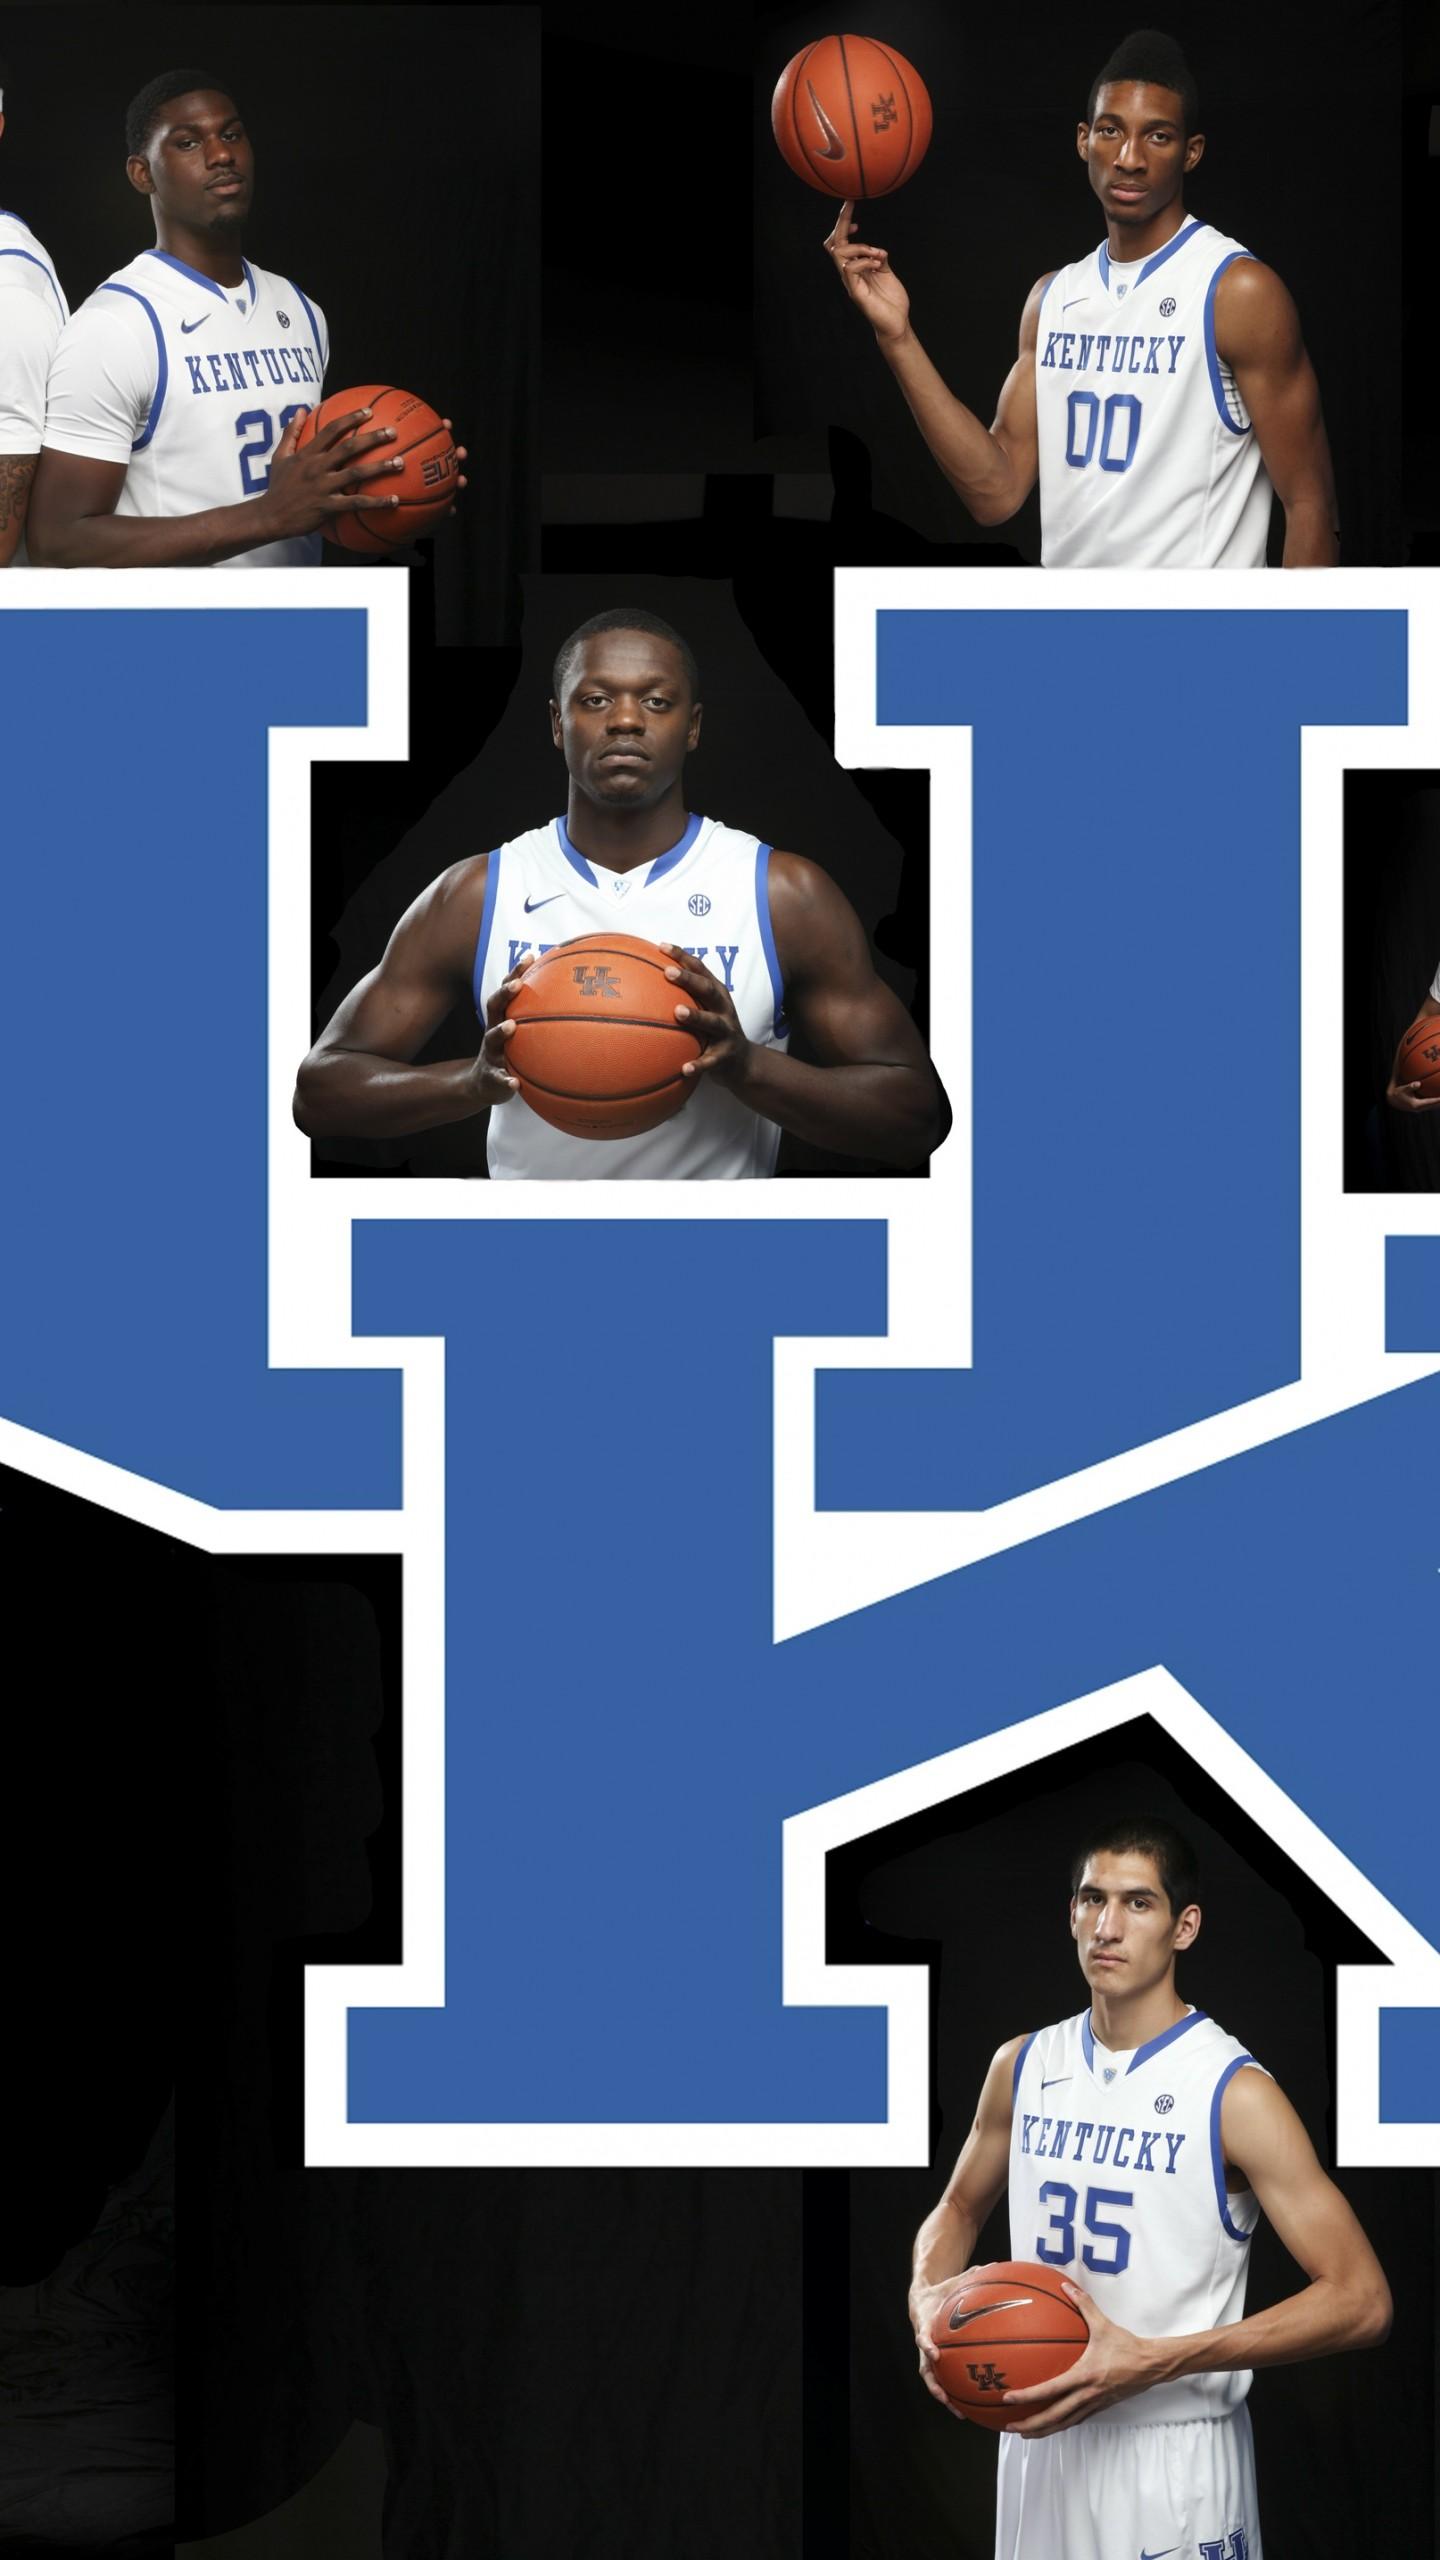 Wallpaper kentucky basketball, kentucky wildcats vs notre dame  fighting irish, wisconsin basketball,